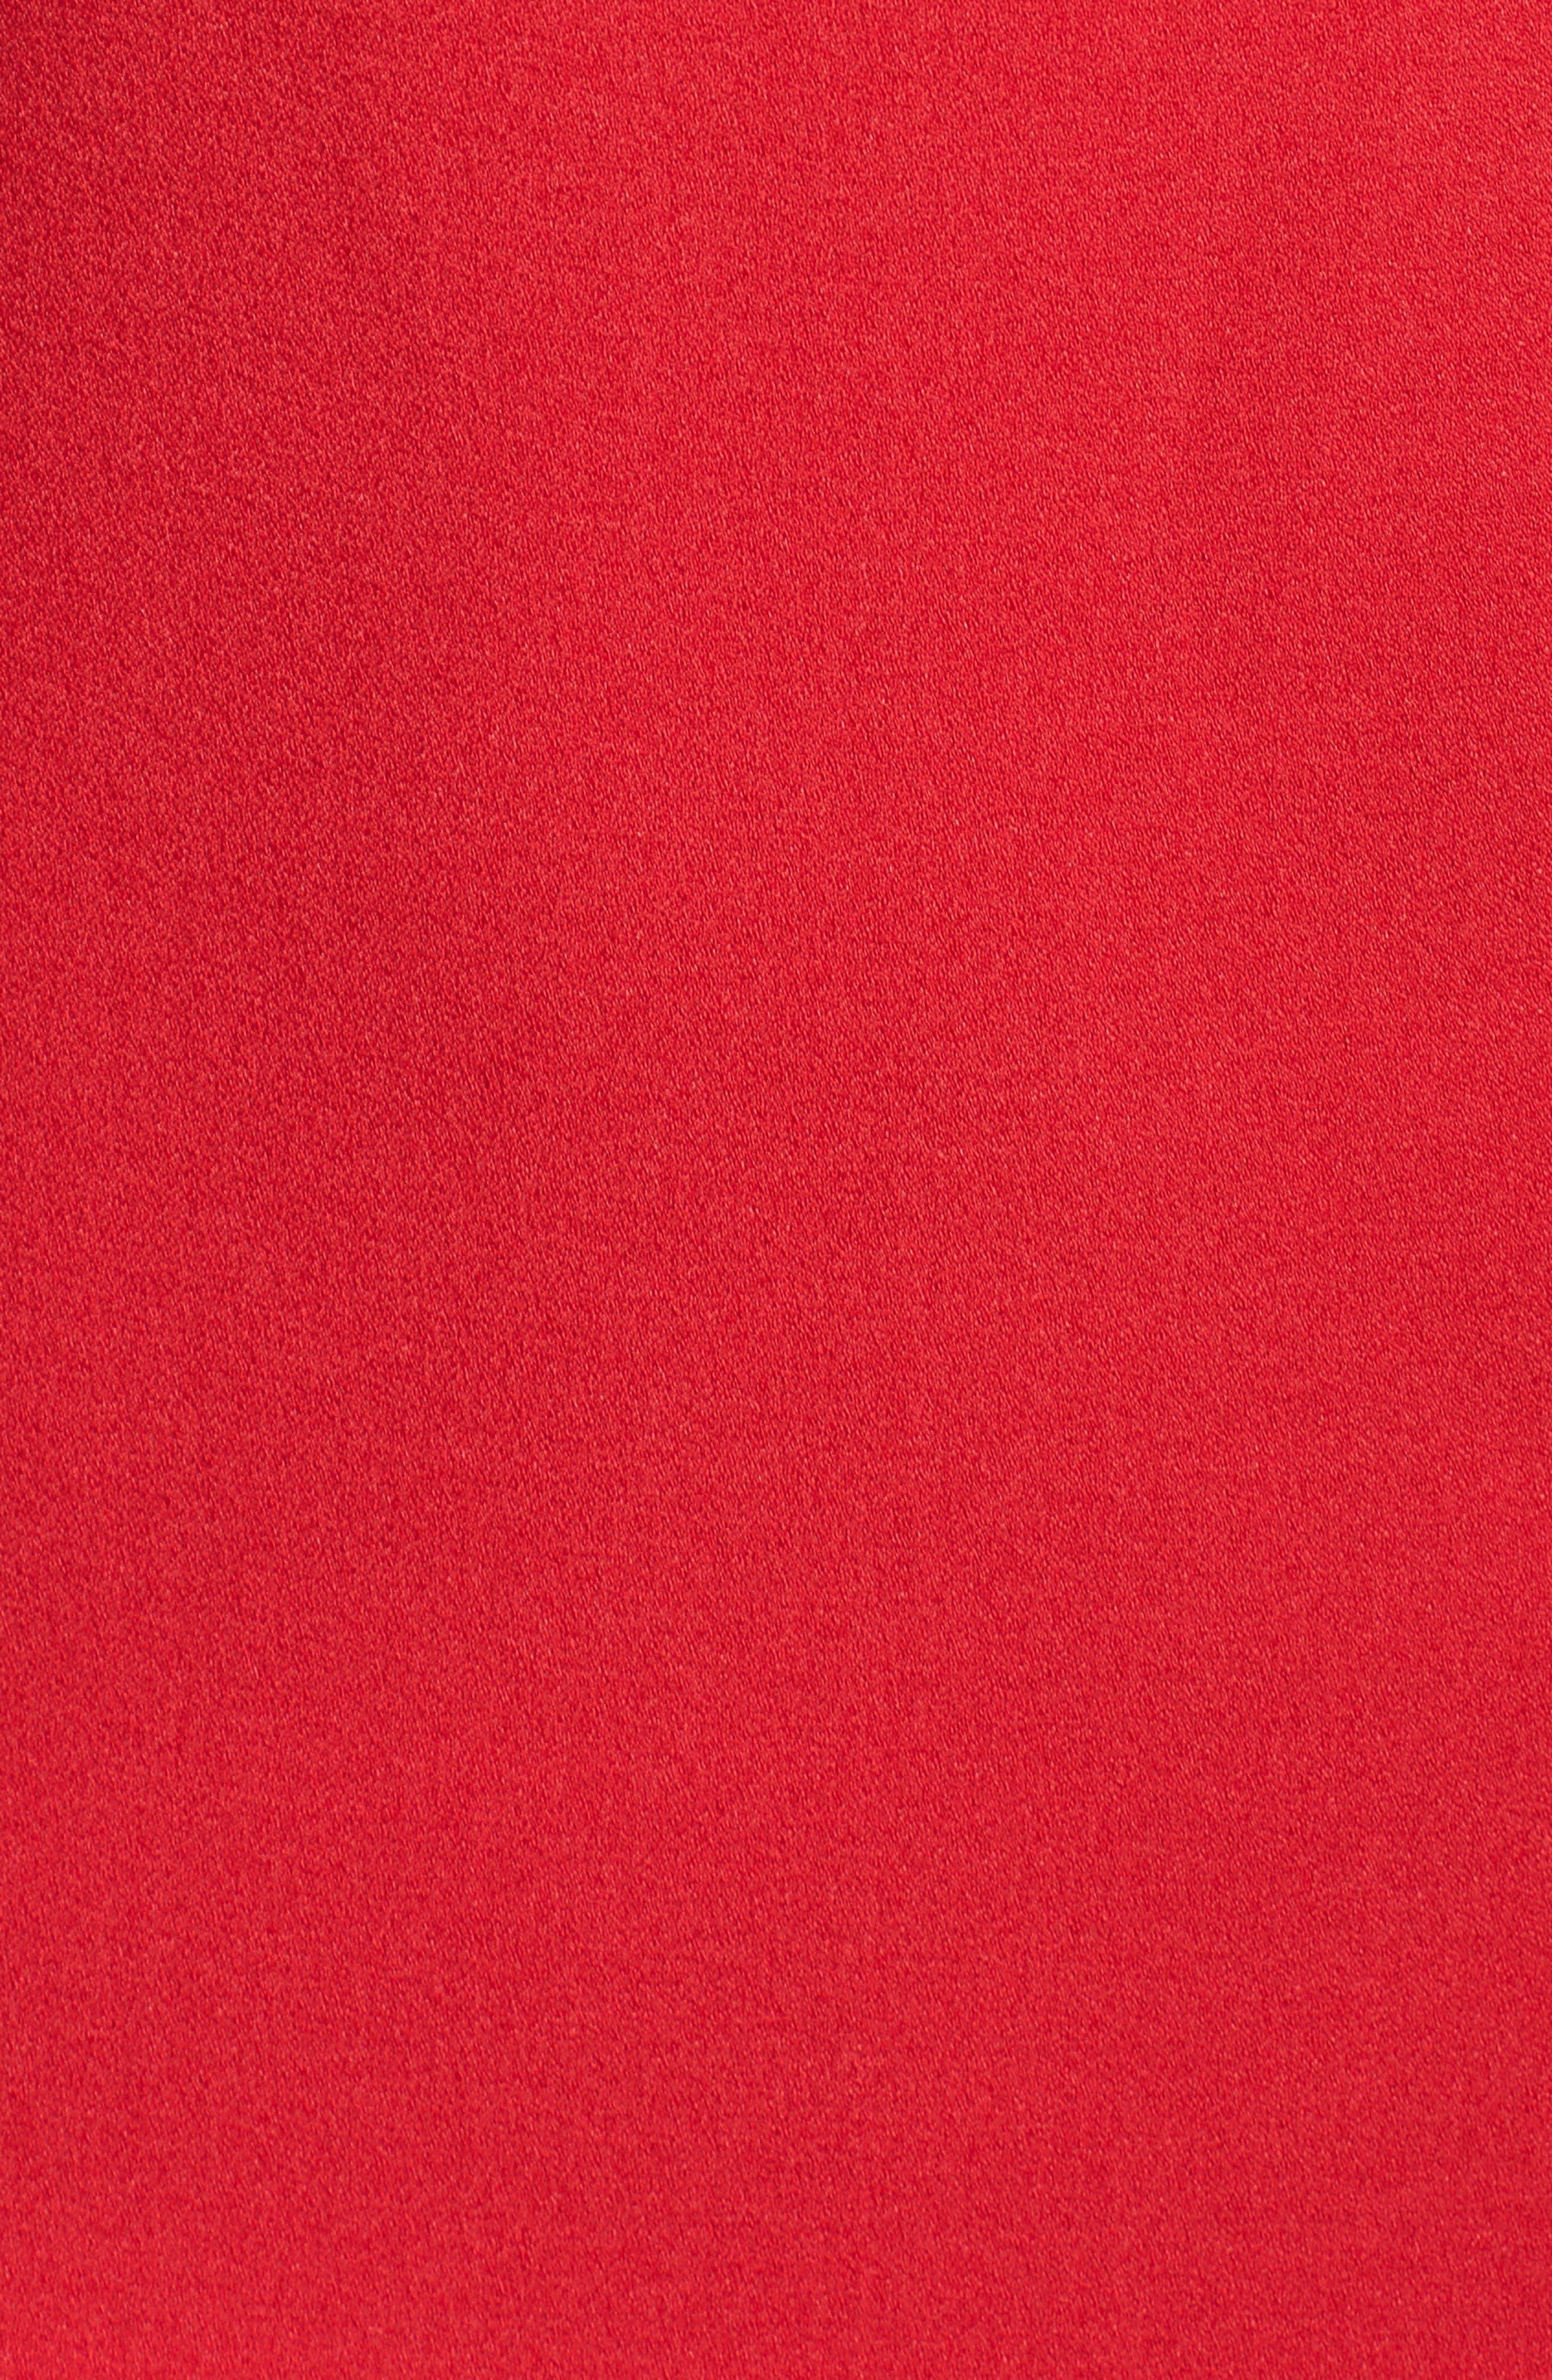 Off the Shoulder Dress,                             Alternate thumbnail 6, color,                             RED JESTER